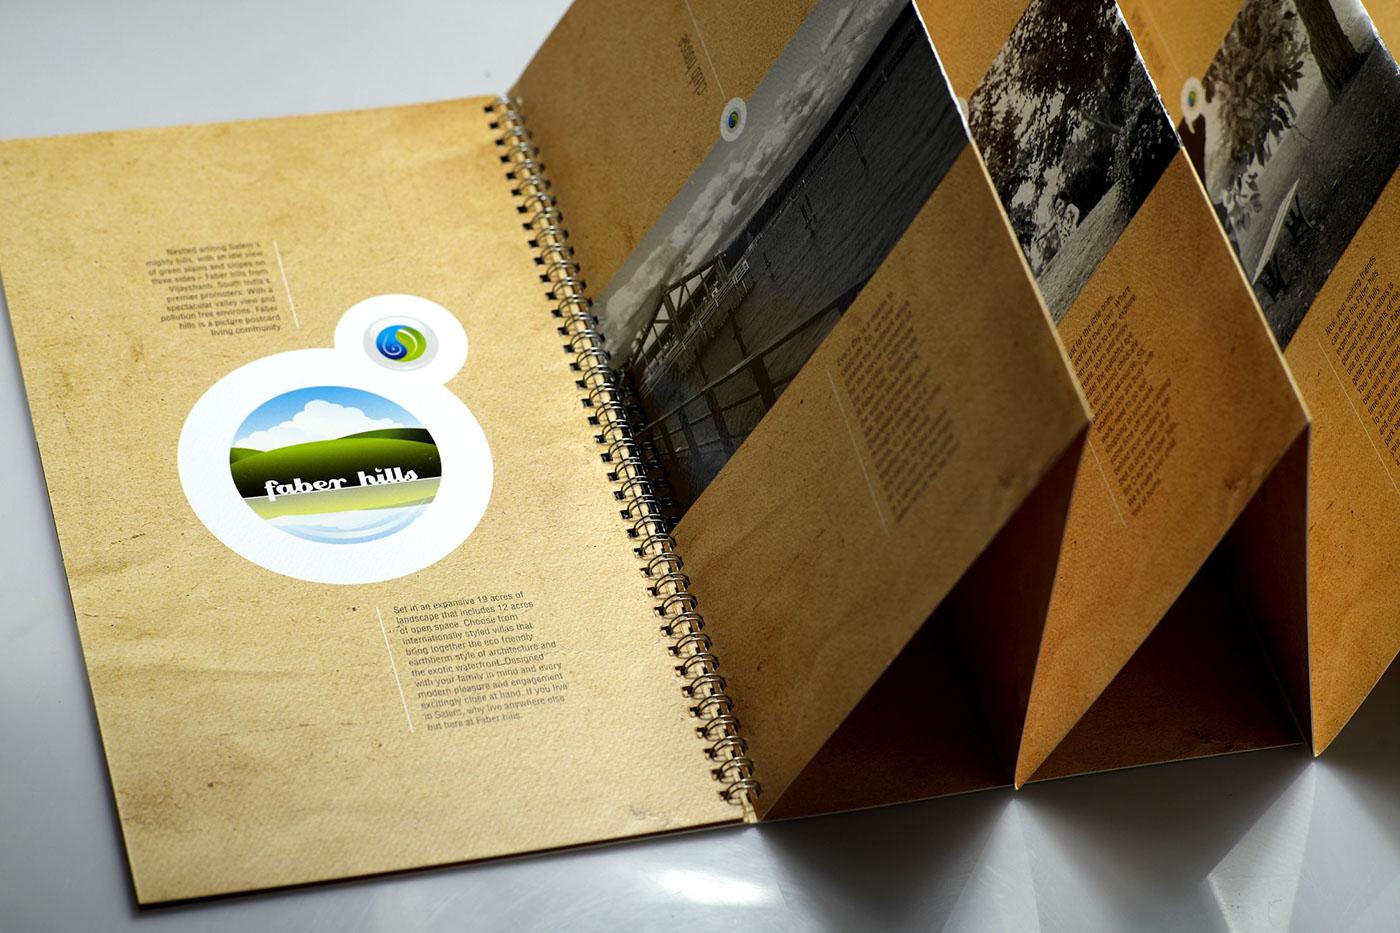 brochure realestate real estate mah mah design strategy innovative brochure Vijay Shanthi